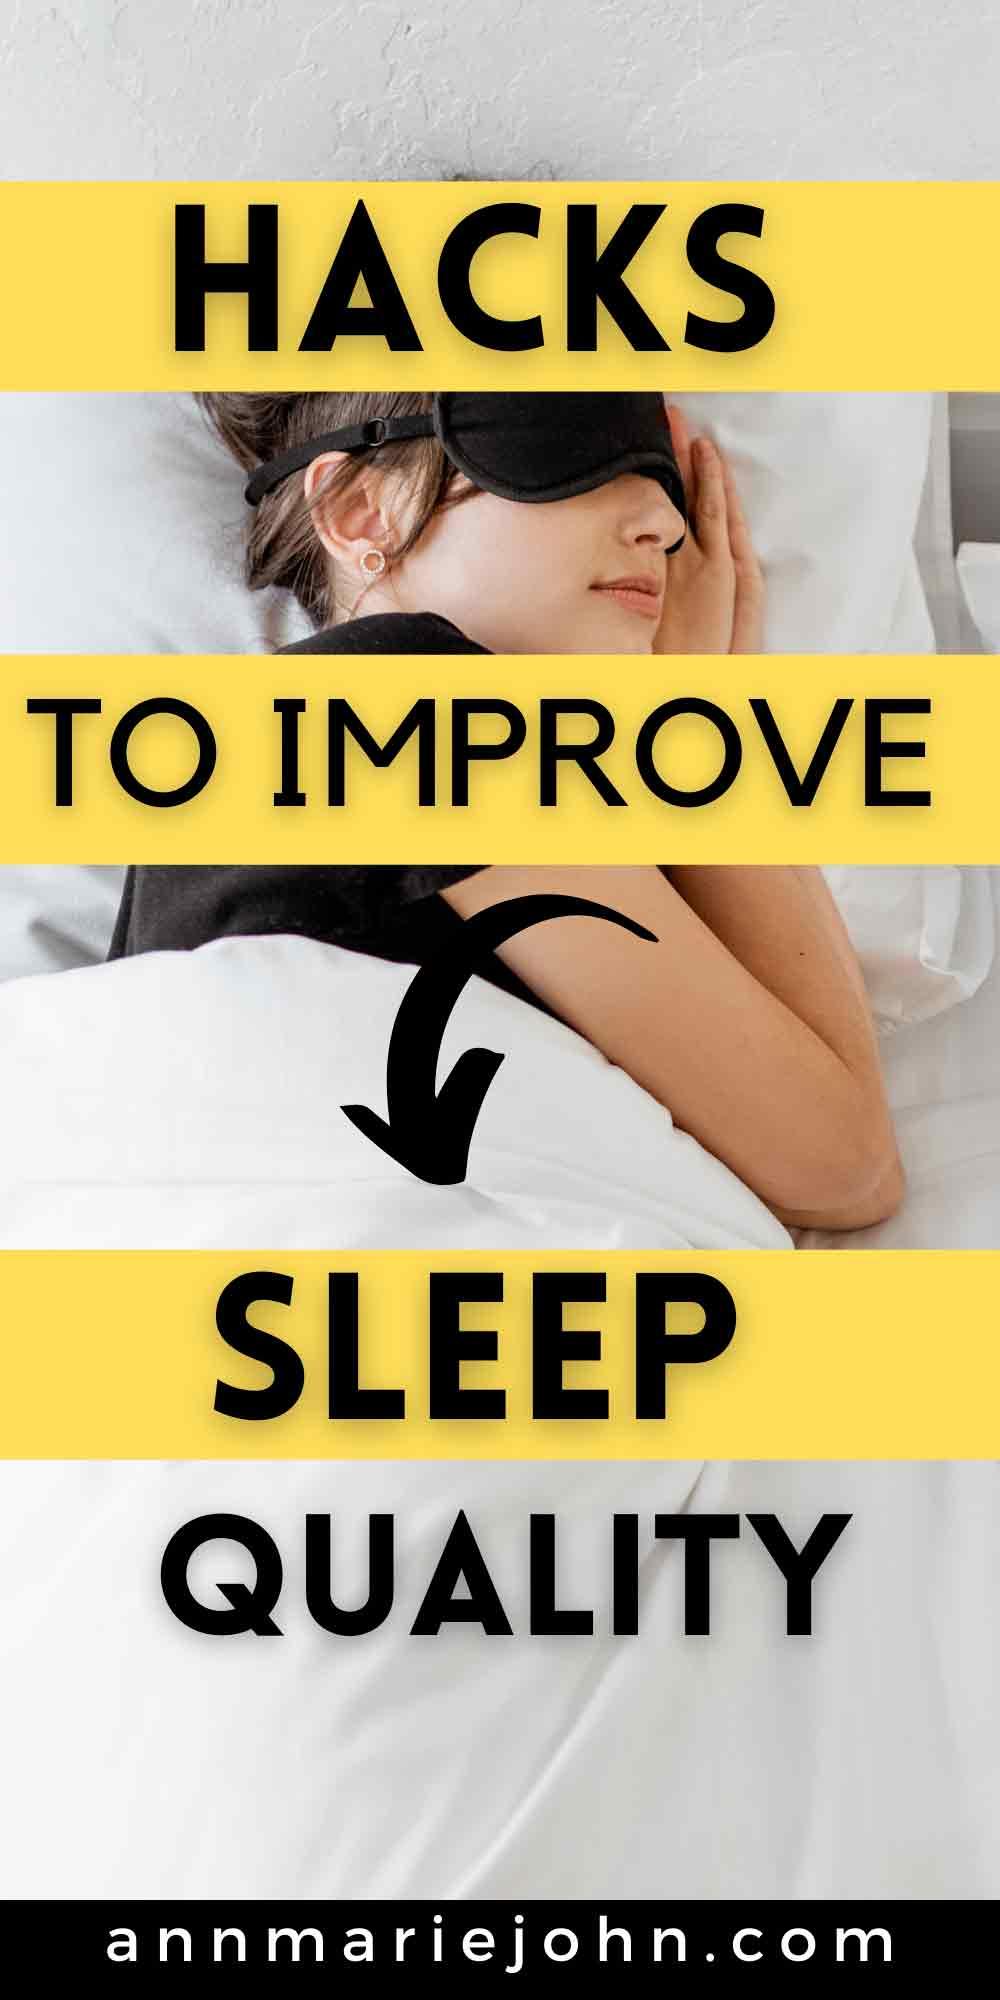 Hacks to Improve Sleep Quality